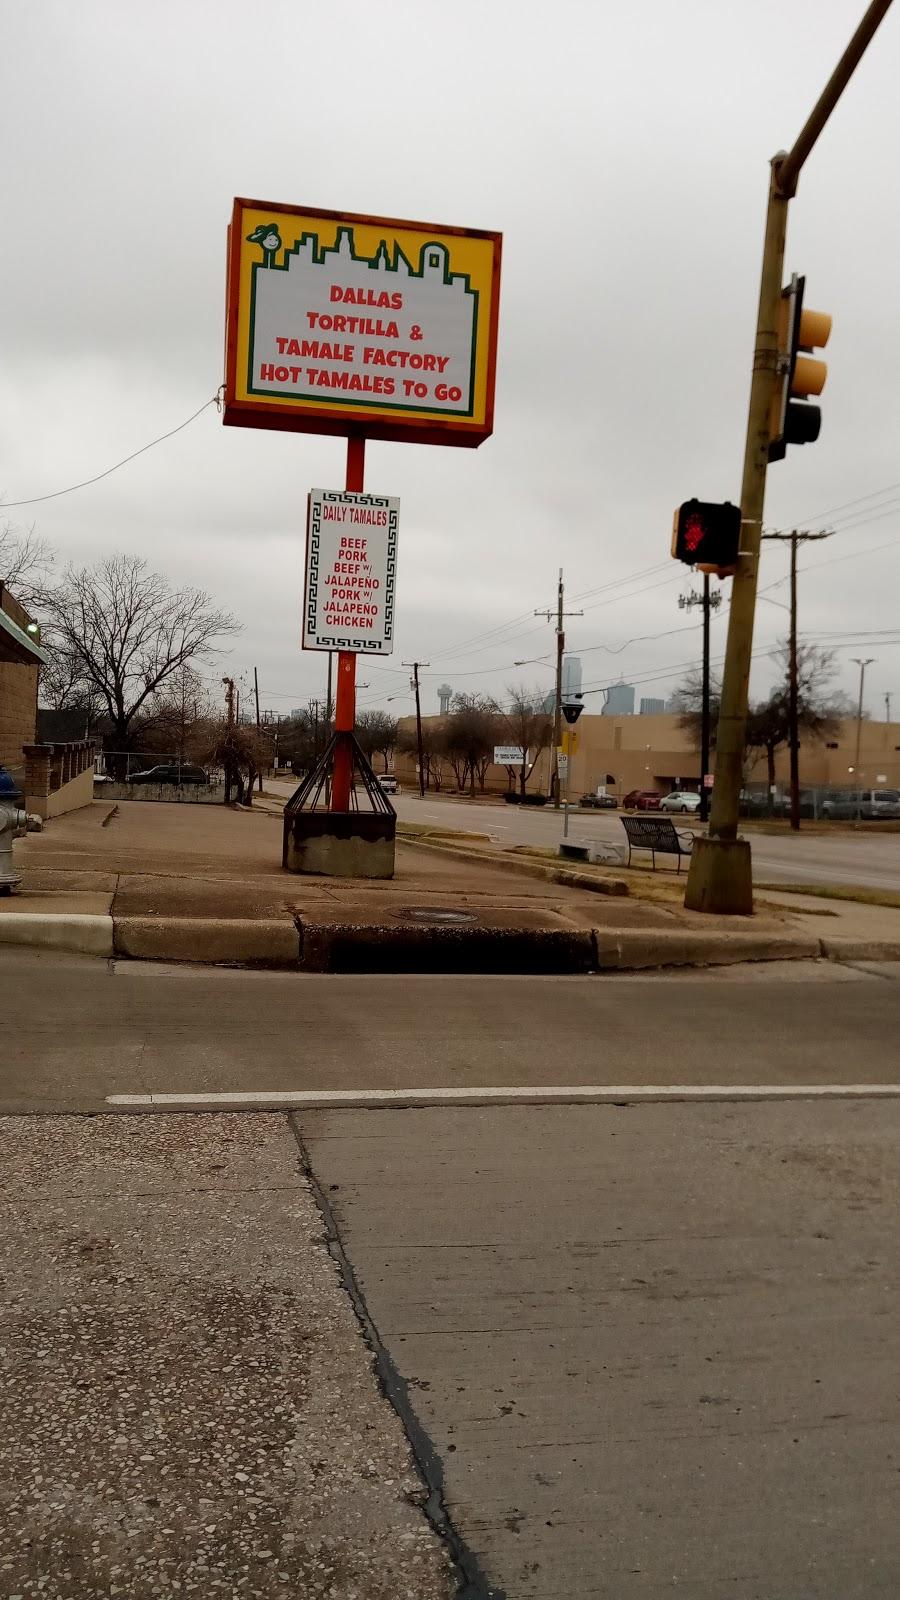 Dallas Tortilla & Tamale Factory - restaurant    Photo 3 of 10   Address: 309 N Marsalis Ave, Dallas, TX 75203, USA   Phone: (214) 943-7681